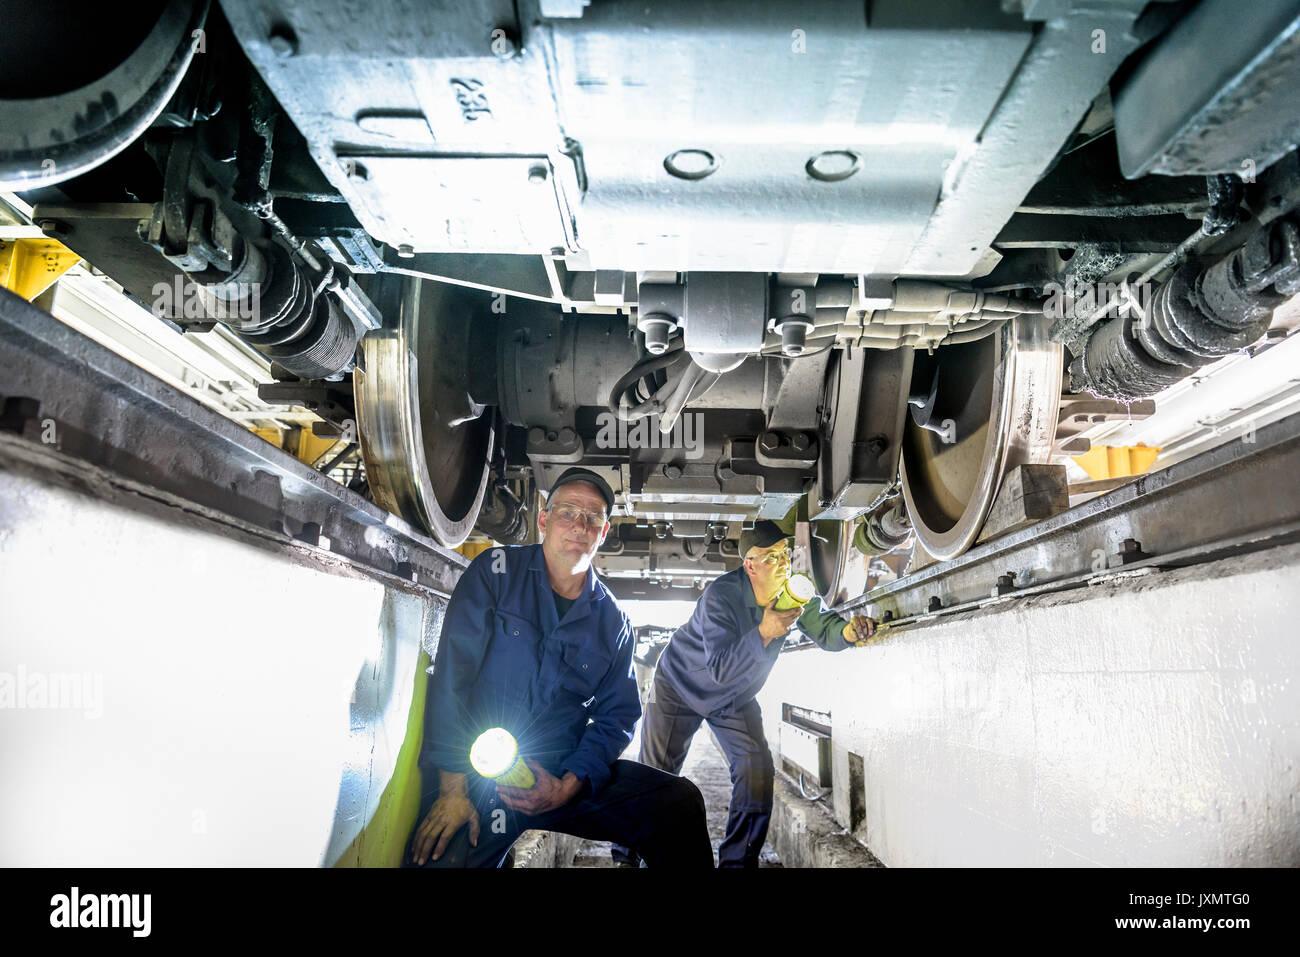 Locomotive engineers inspecting underside of locomotive in train works - Stock Image